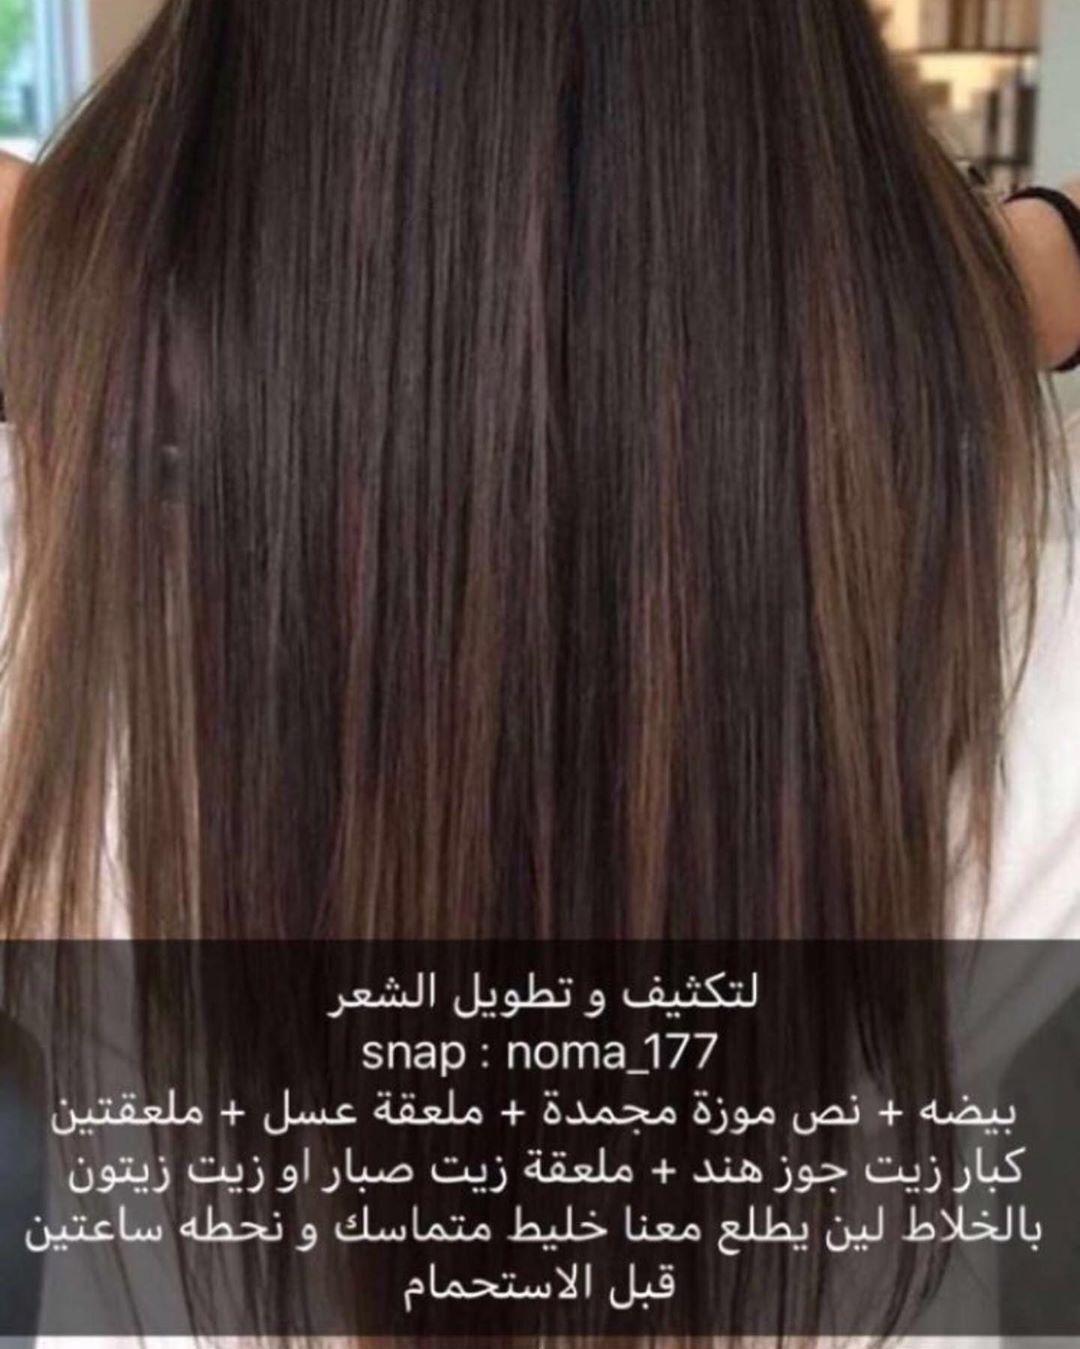 Pin By H On العناية بالشعر Long Hair Styles Hair Styles Beauty